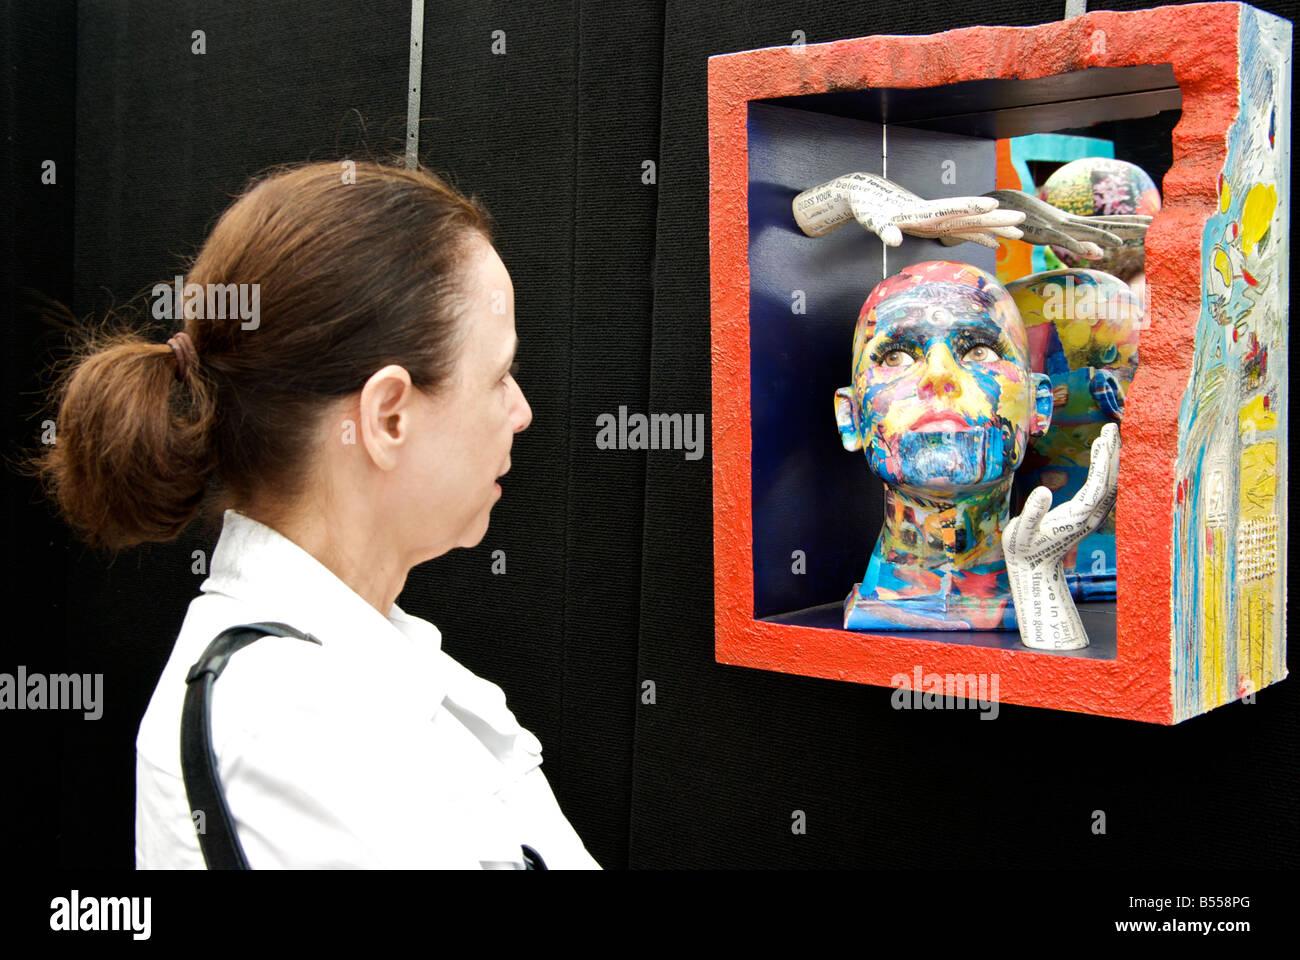 Woman at Bayou City Art Festival in Houston Texas looking at Sheryl McDonald 3 D mixed media mannequin art exhibit - Stock Image